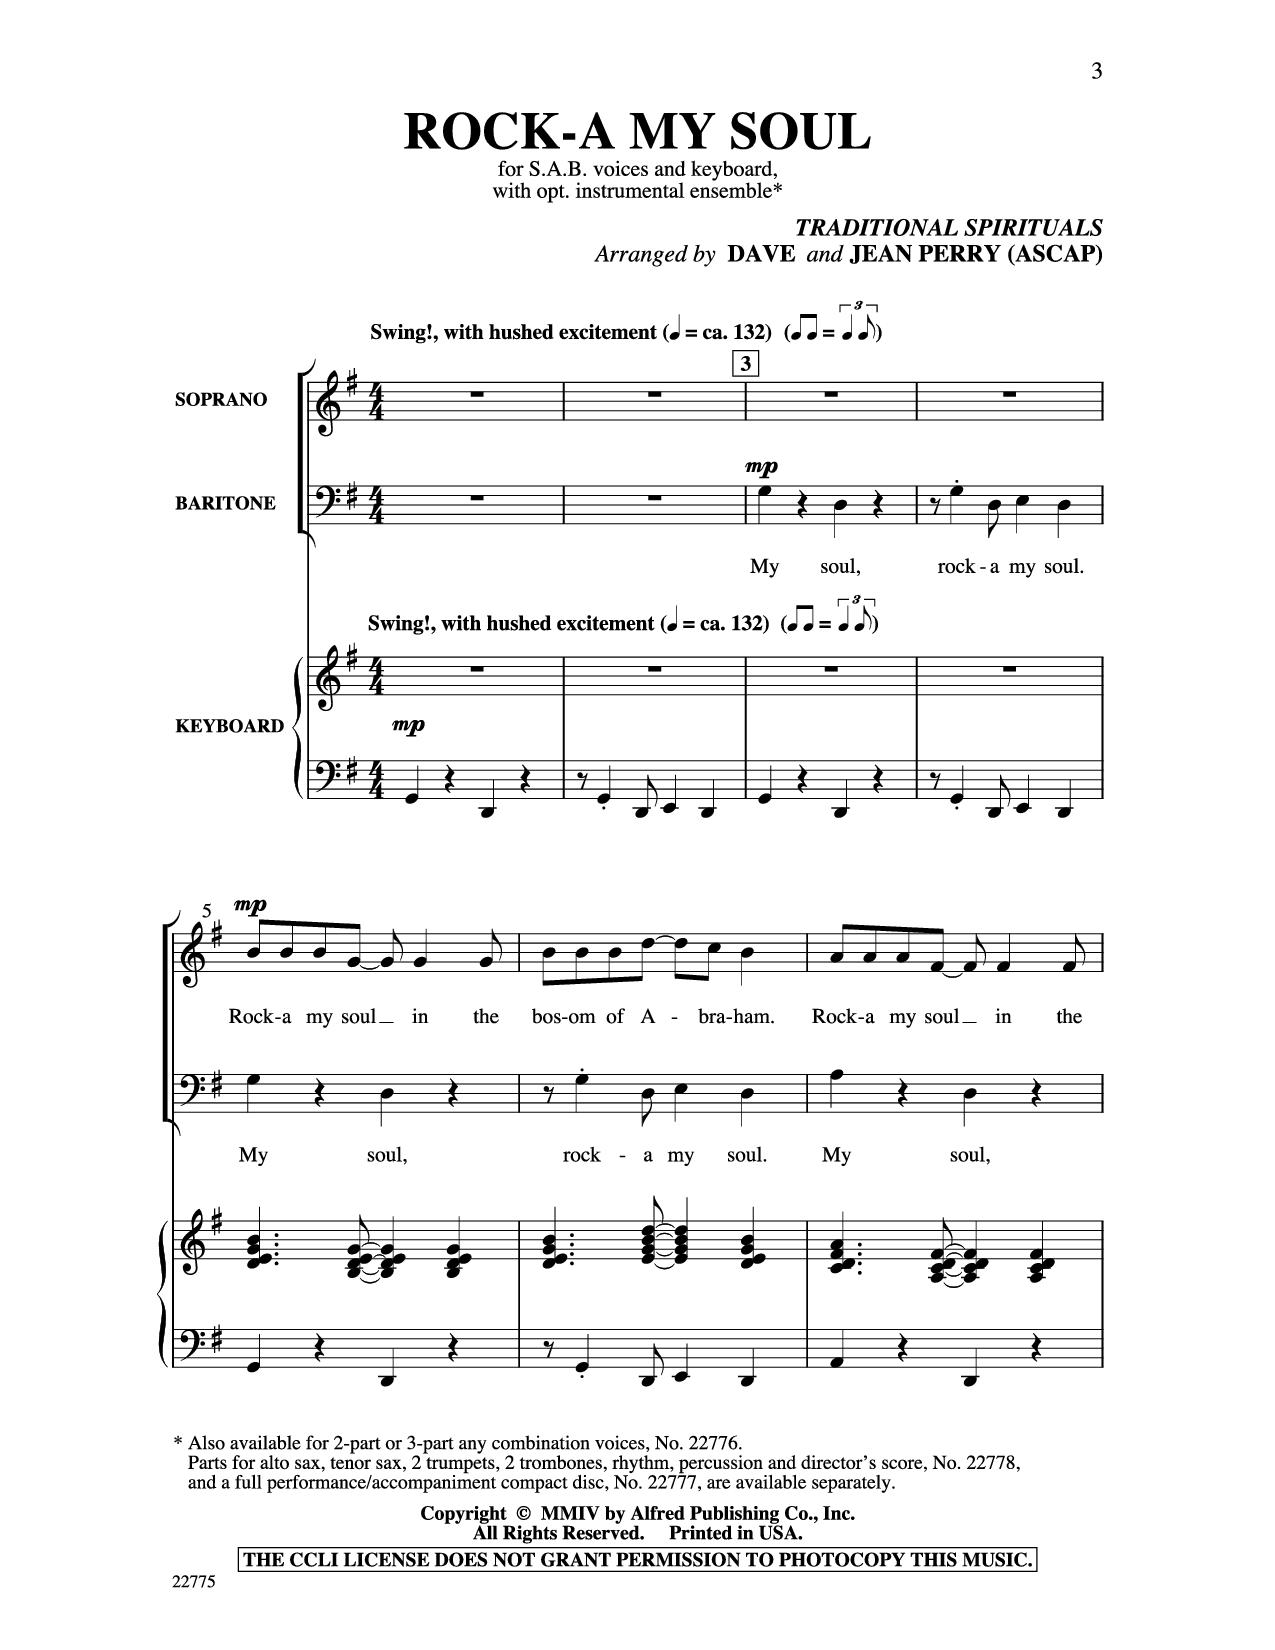 Lyrics for 'Rock-A My Soul'